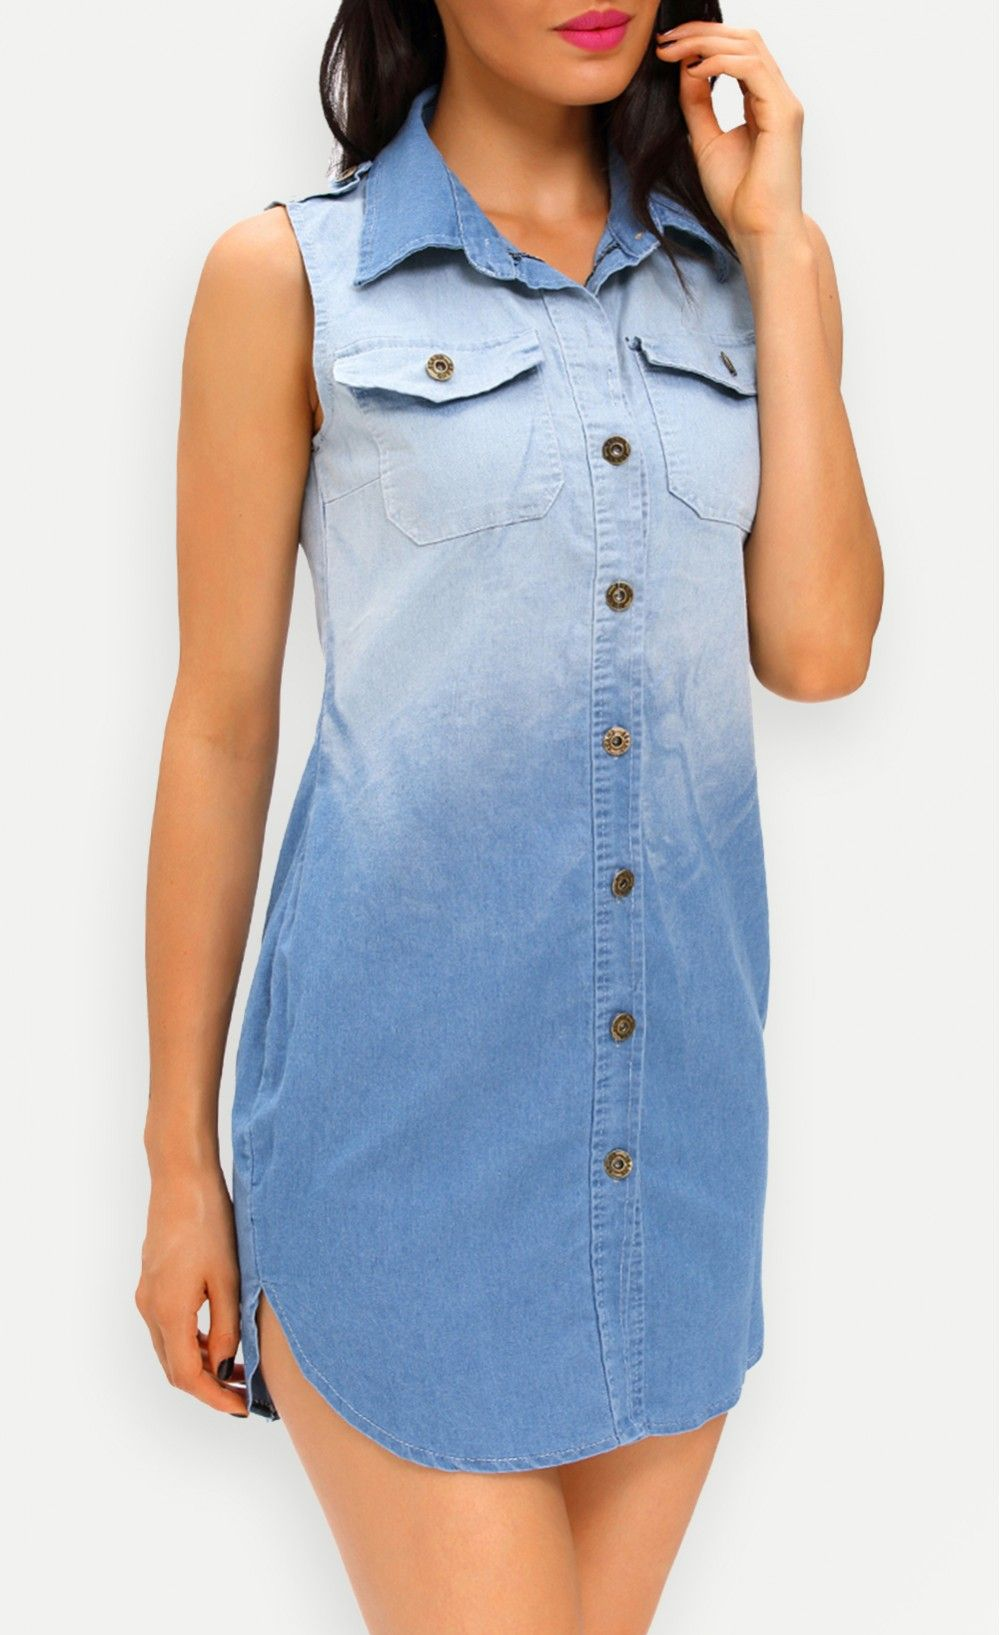 Button down sleeveless denim shirt dress with images